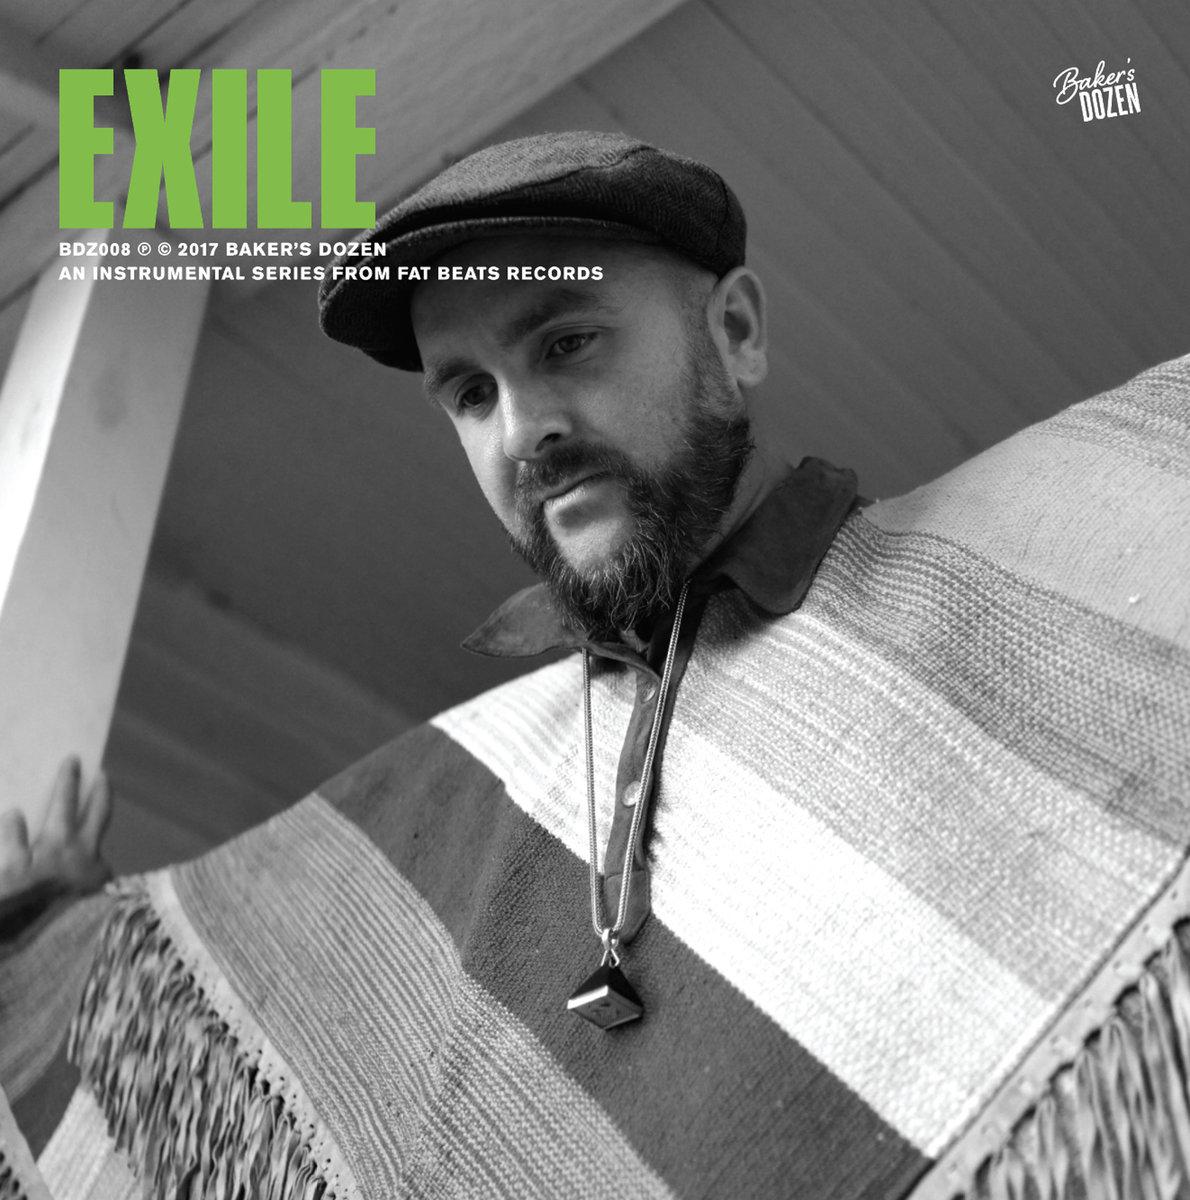 Exile - Baker's Dozen (An Instrumental Series From Fat Beats Records) [audio]